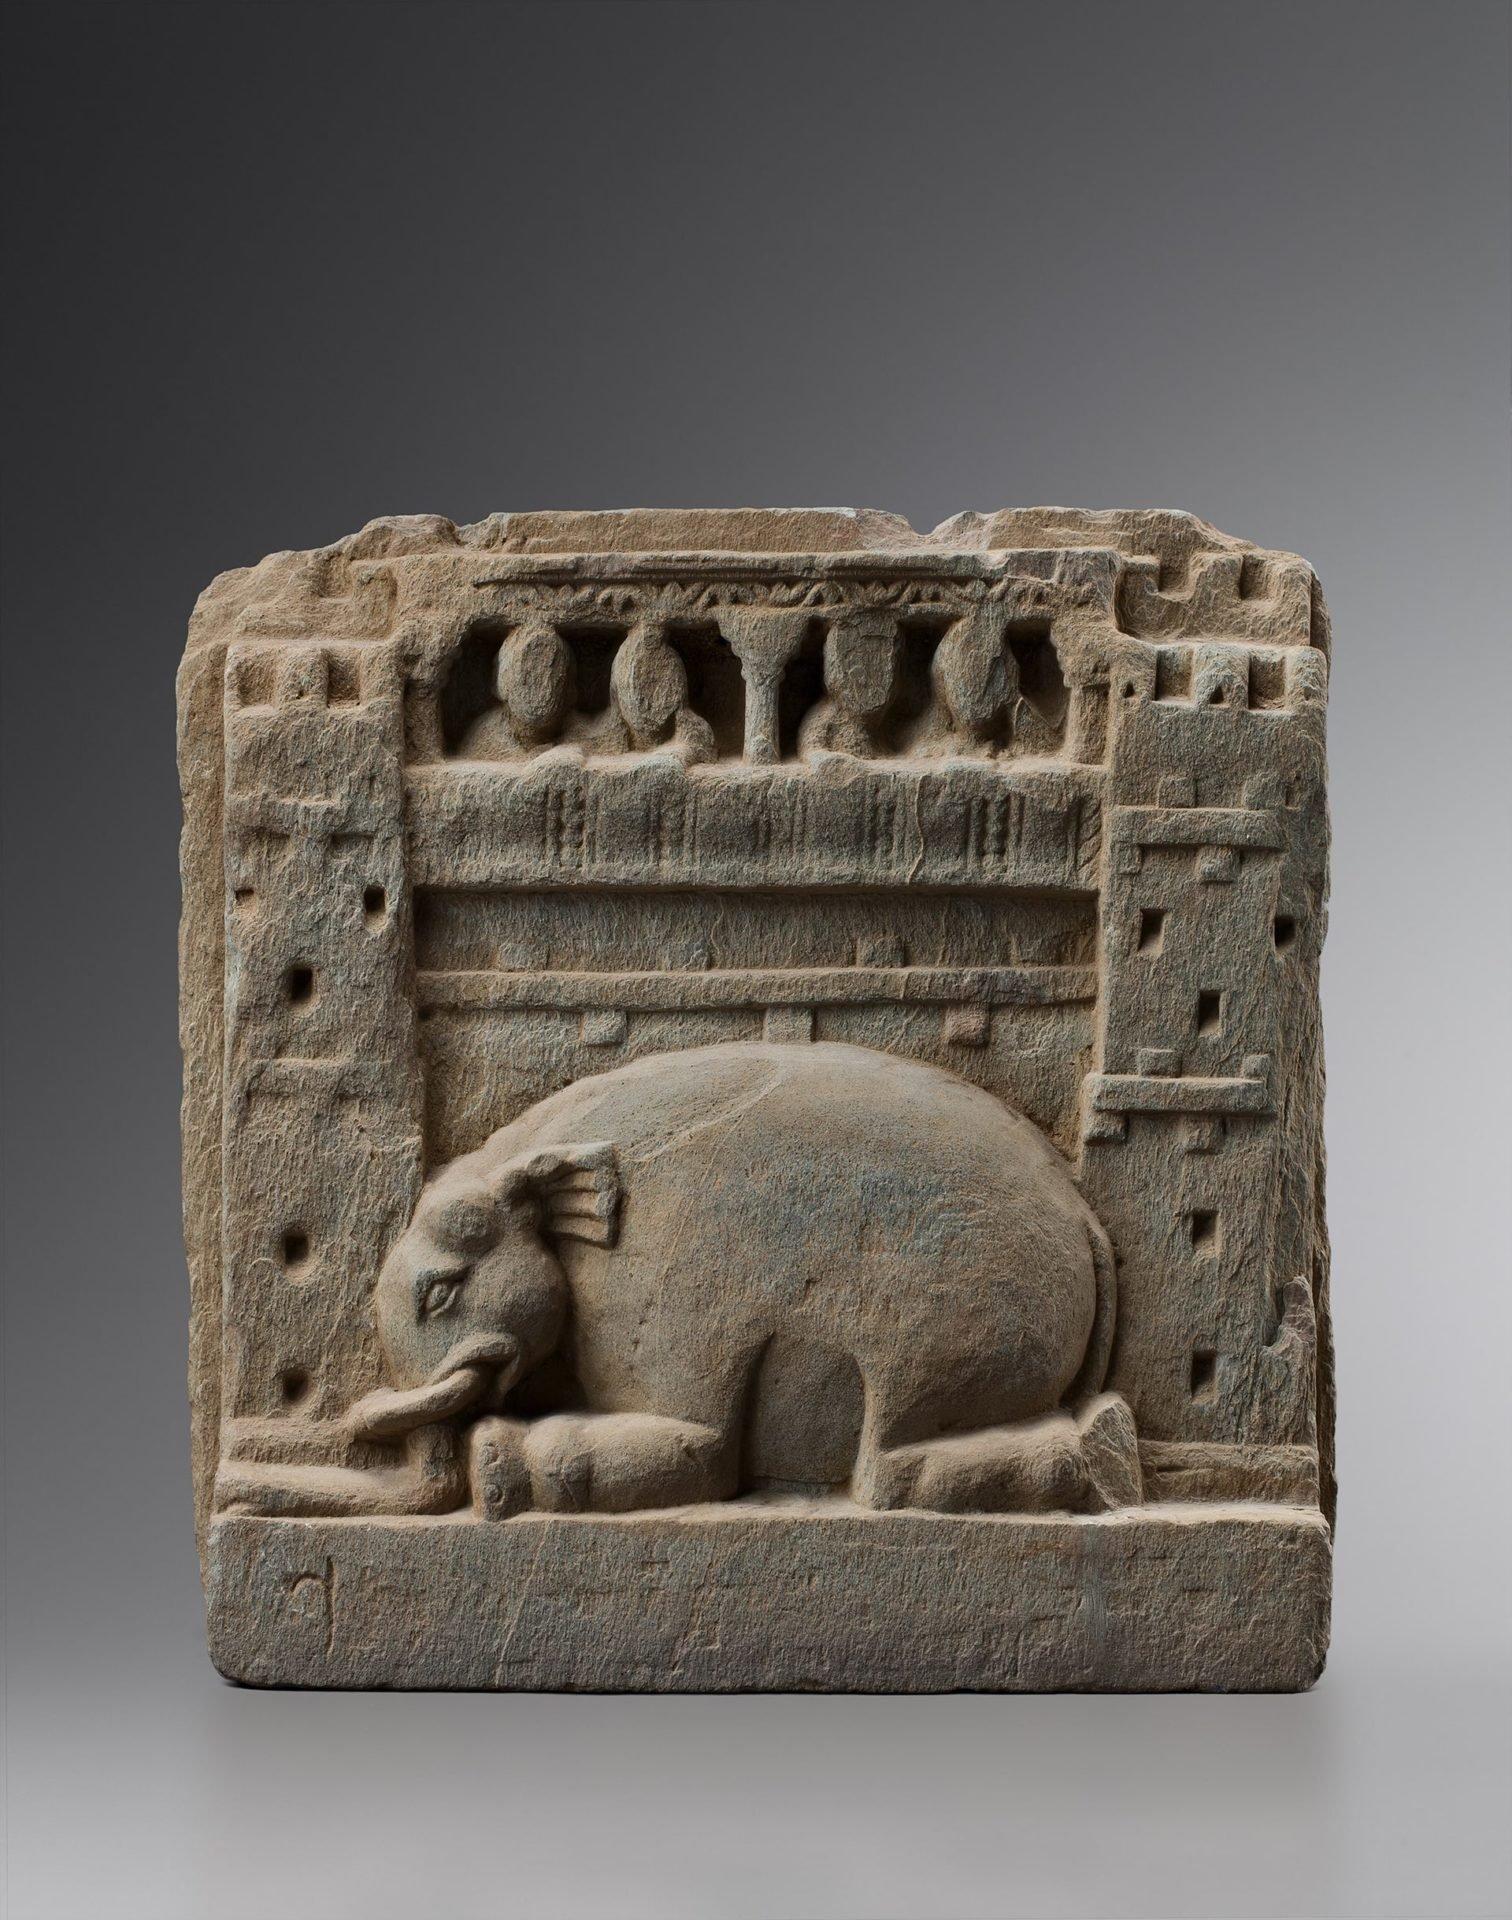 Grusenmeyer_Woliner_Gandhara_relief_White_elephan_-1512x1920.jpg